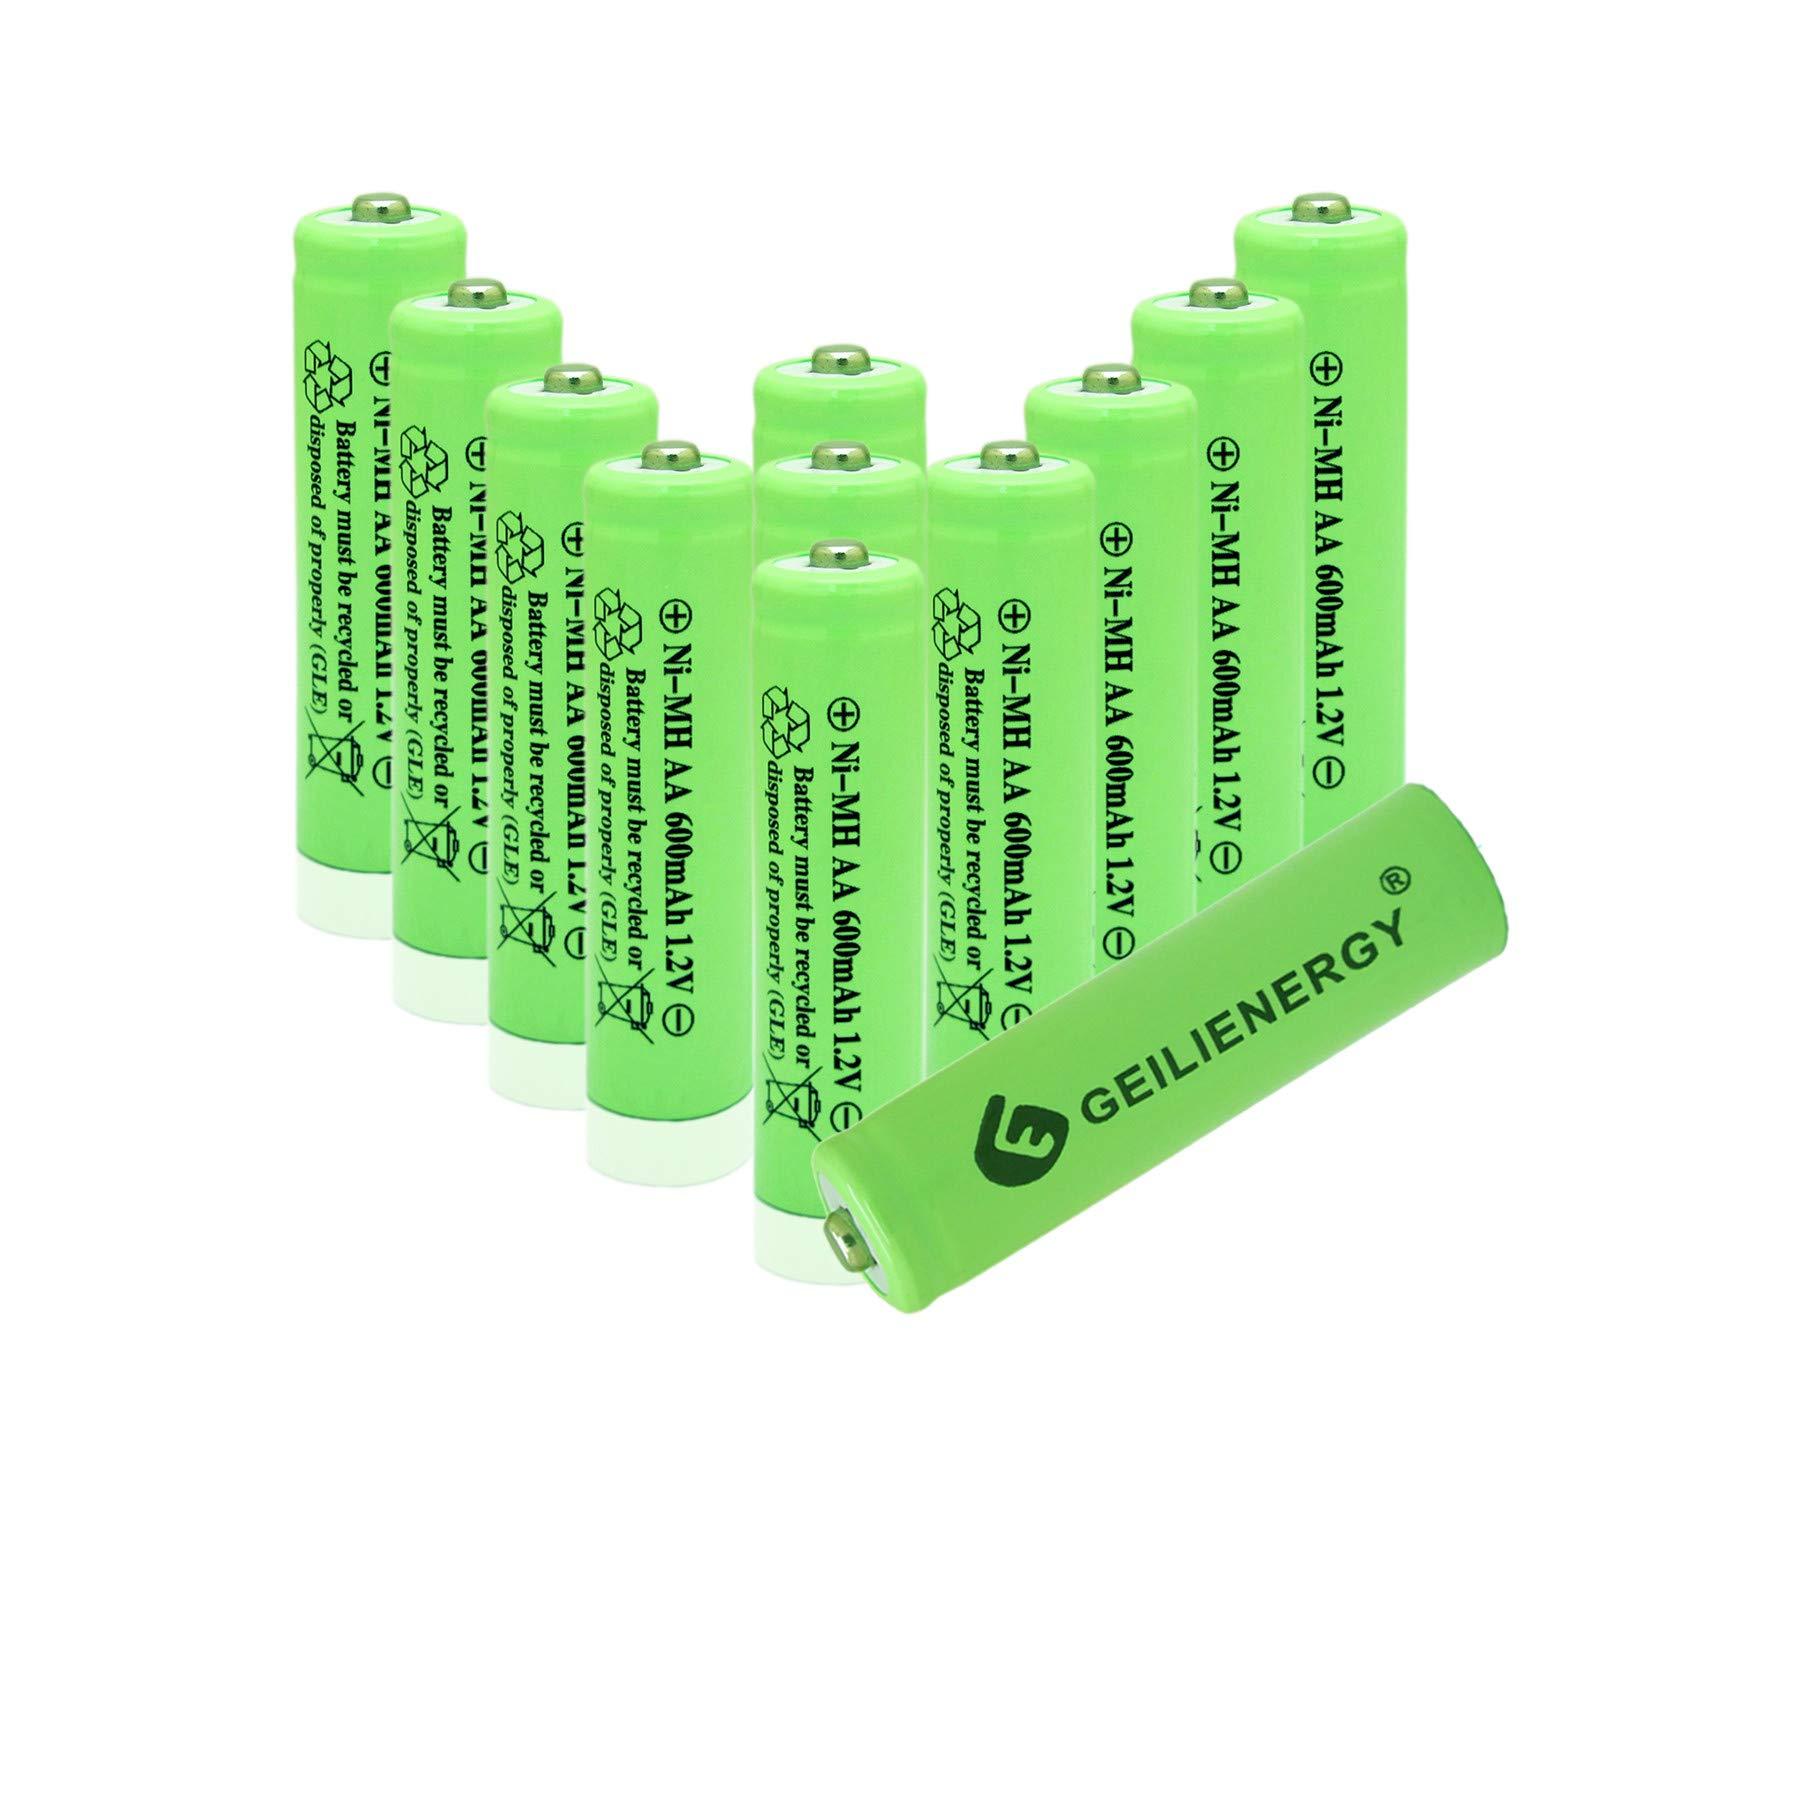 Pack of 20 RELIGHTABLE AA NiMh 600mAh 1.2V Rechargeable Batteries for Solar Garden Lights